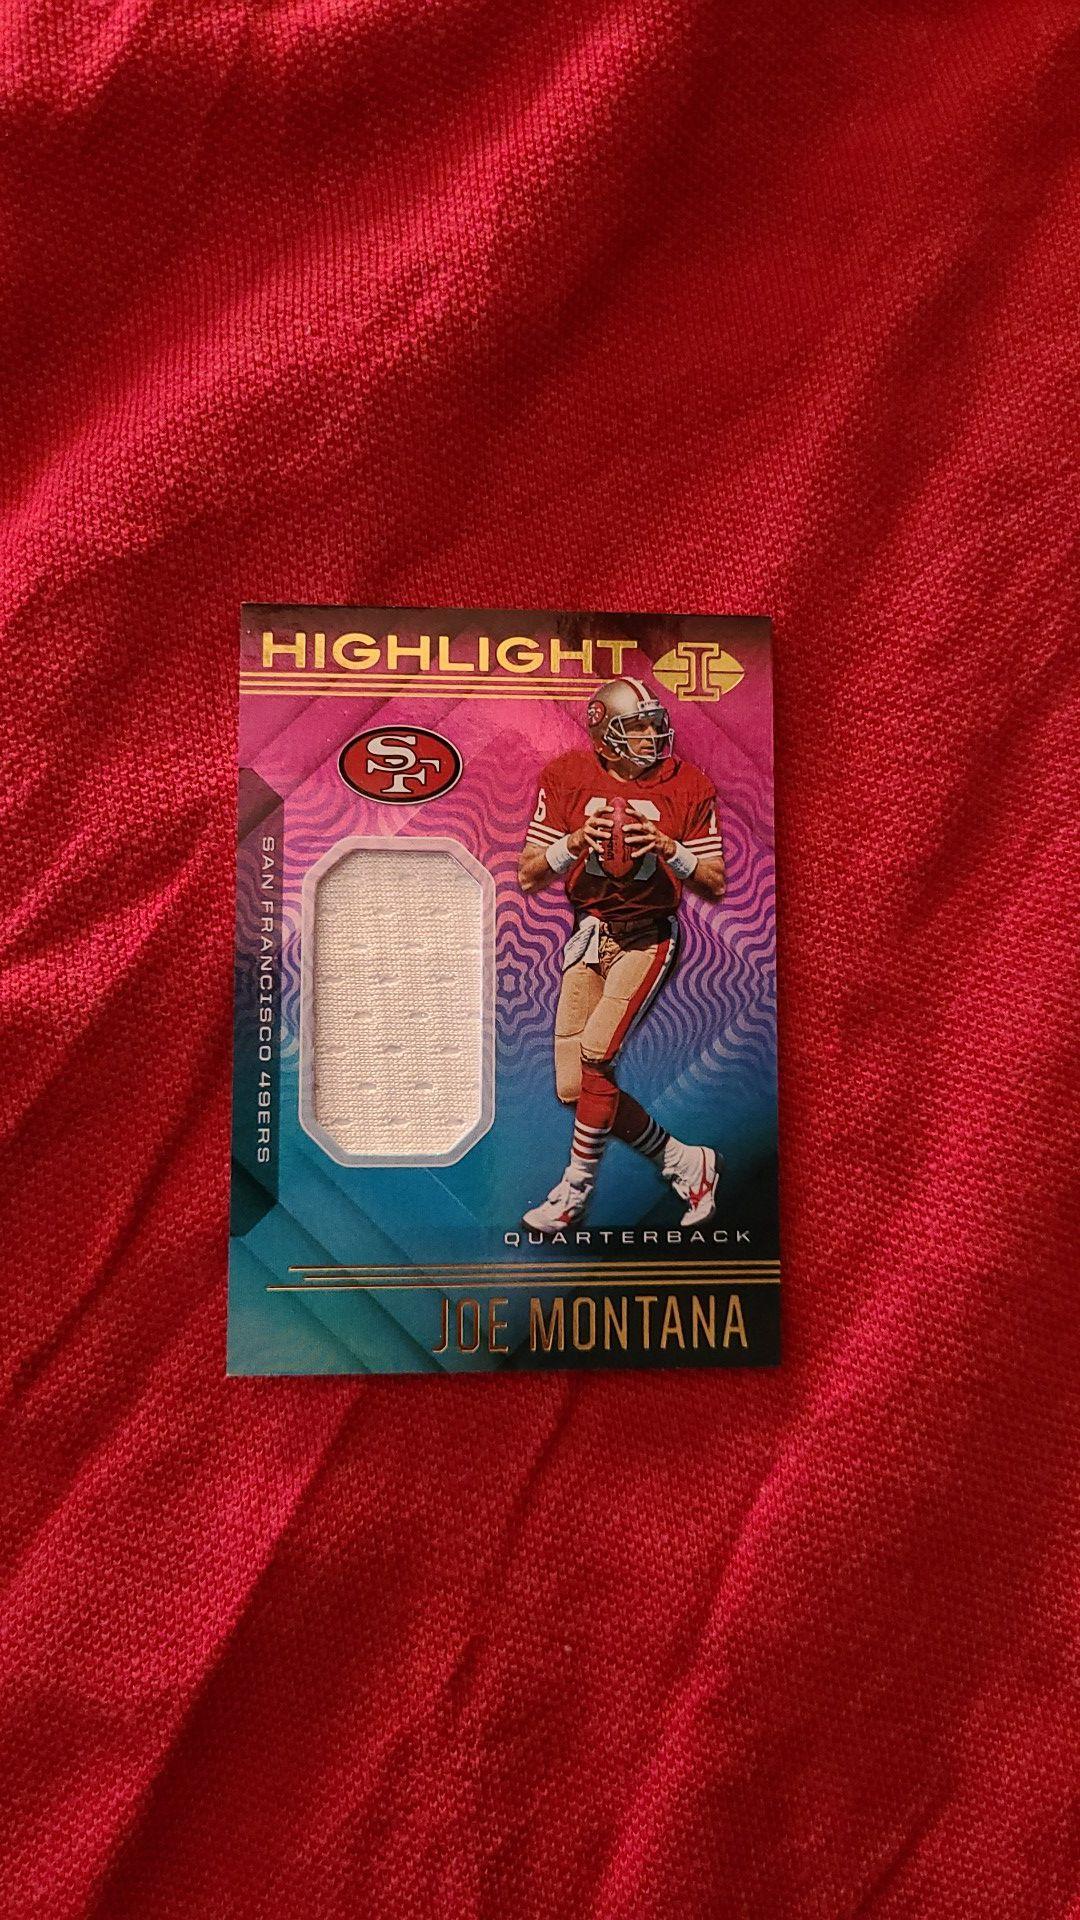 Joe montana illusion jersey football card